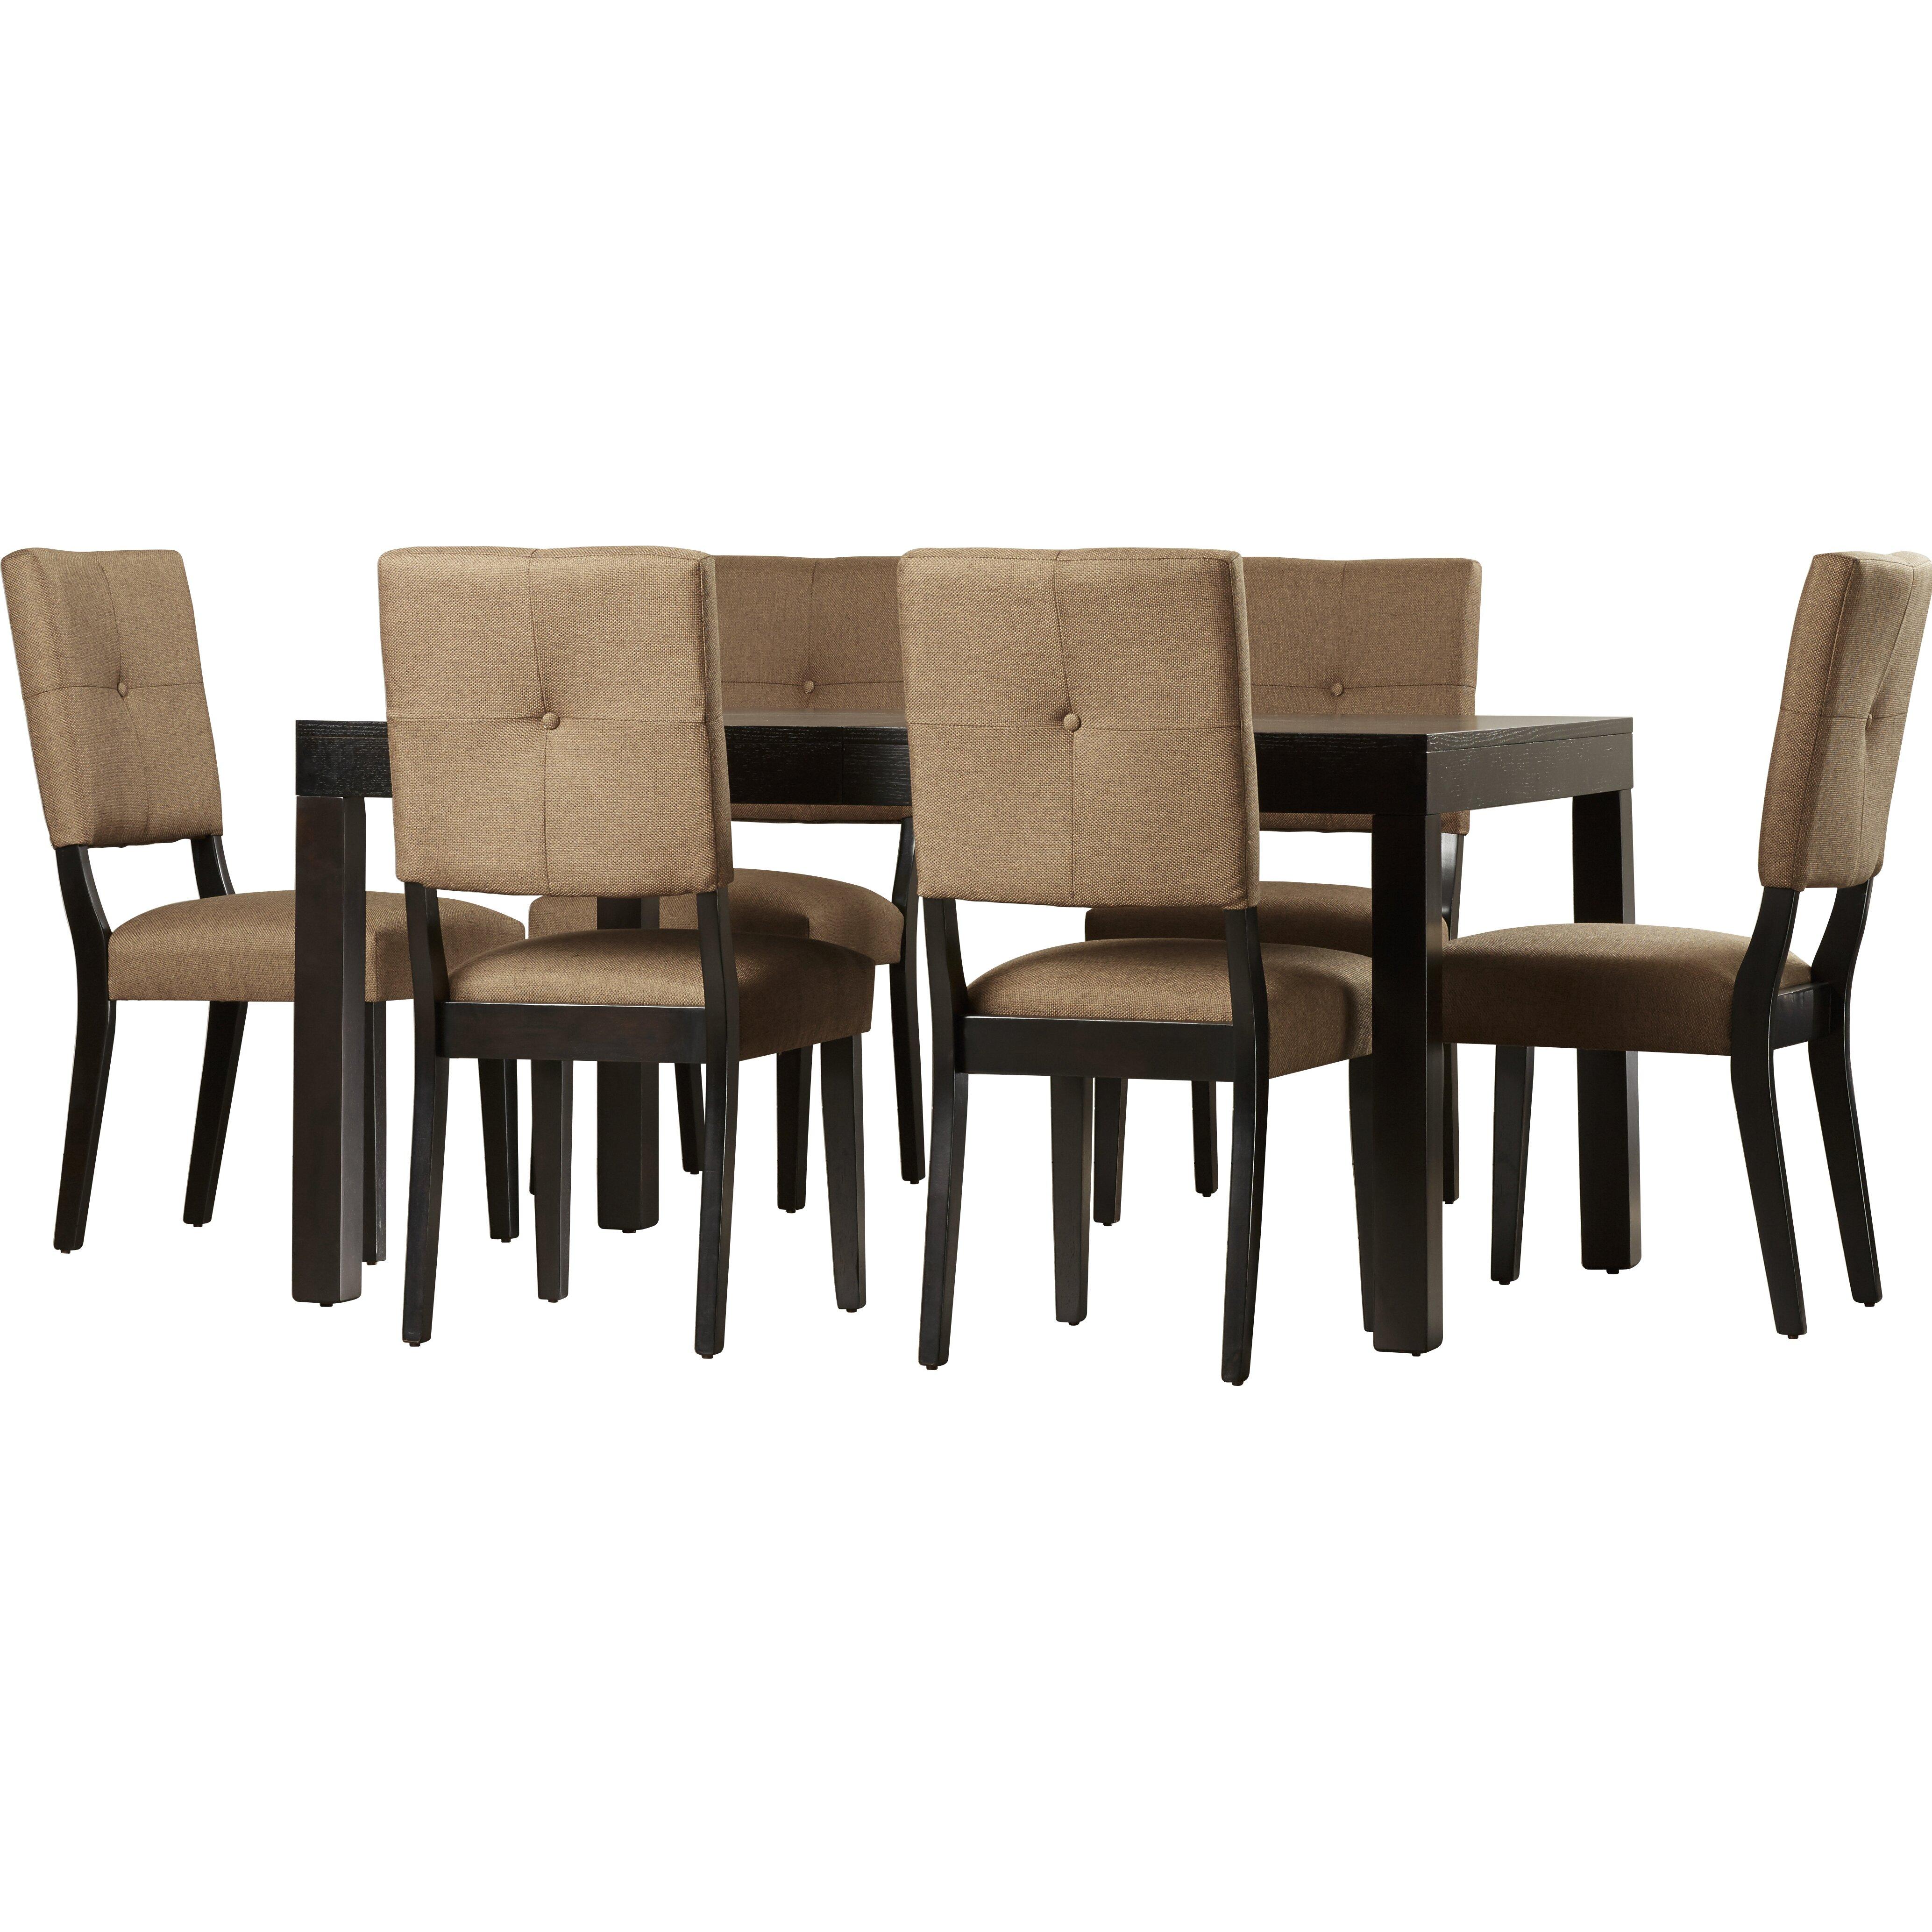 Brayden Studio Mcwhorter Dining Table Reviews: Brayden Studio Fairlee 7 Piece Dining Set & Reviews